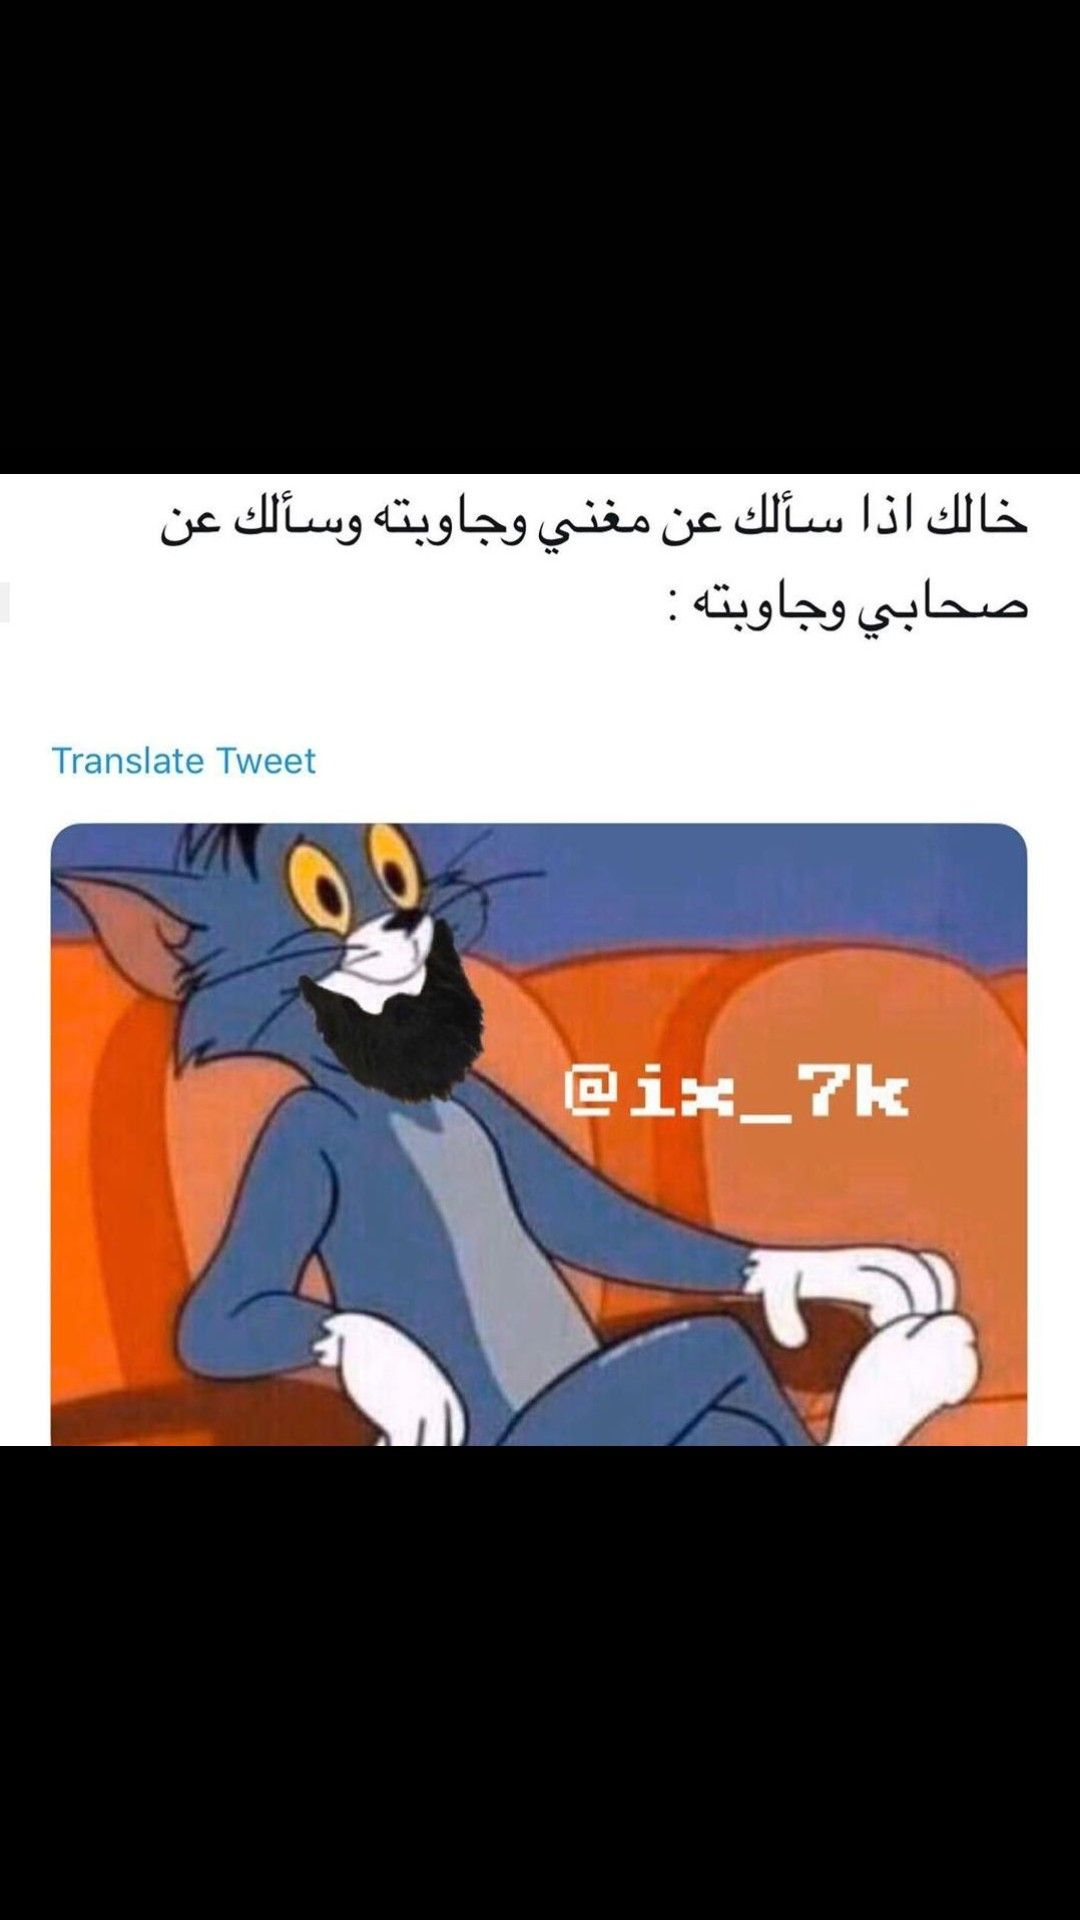 Pin By Jojo On استهبال Black Anime Characters Arabic Memes Islam Beliefs